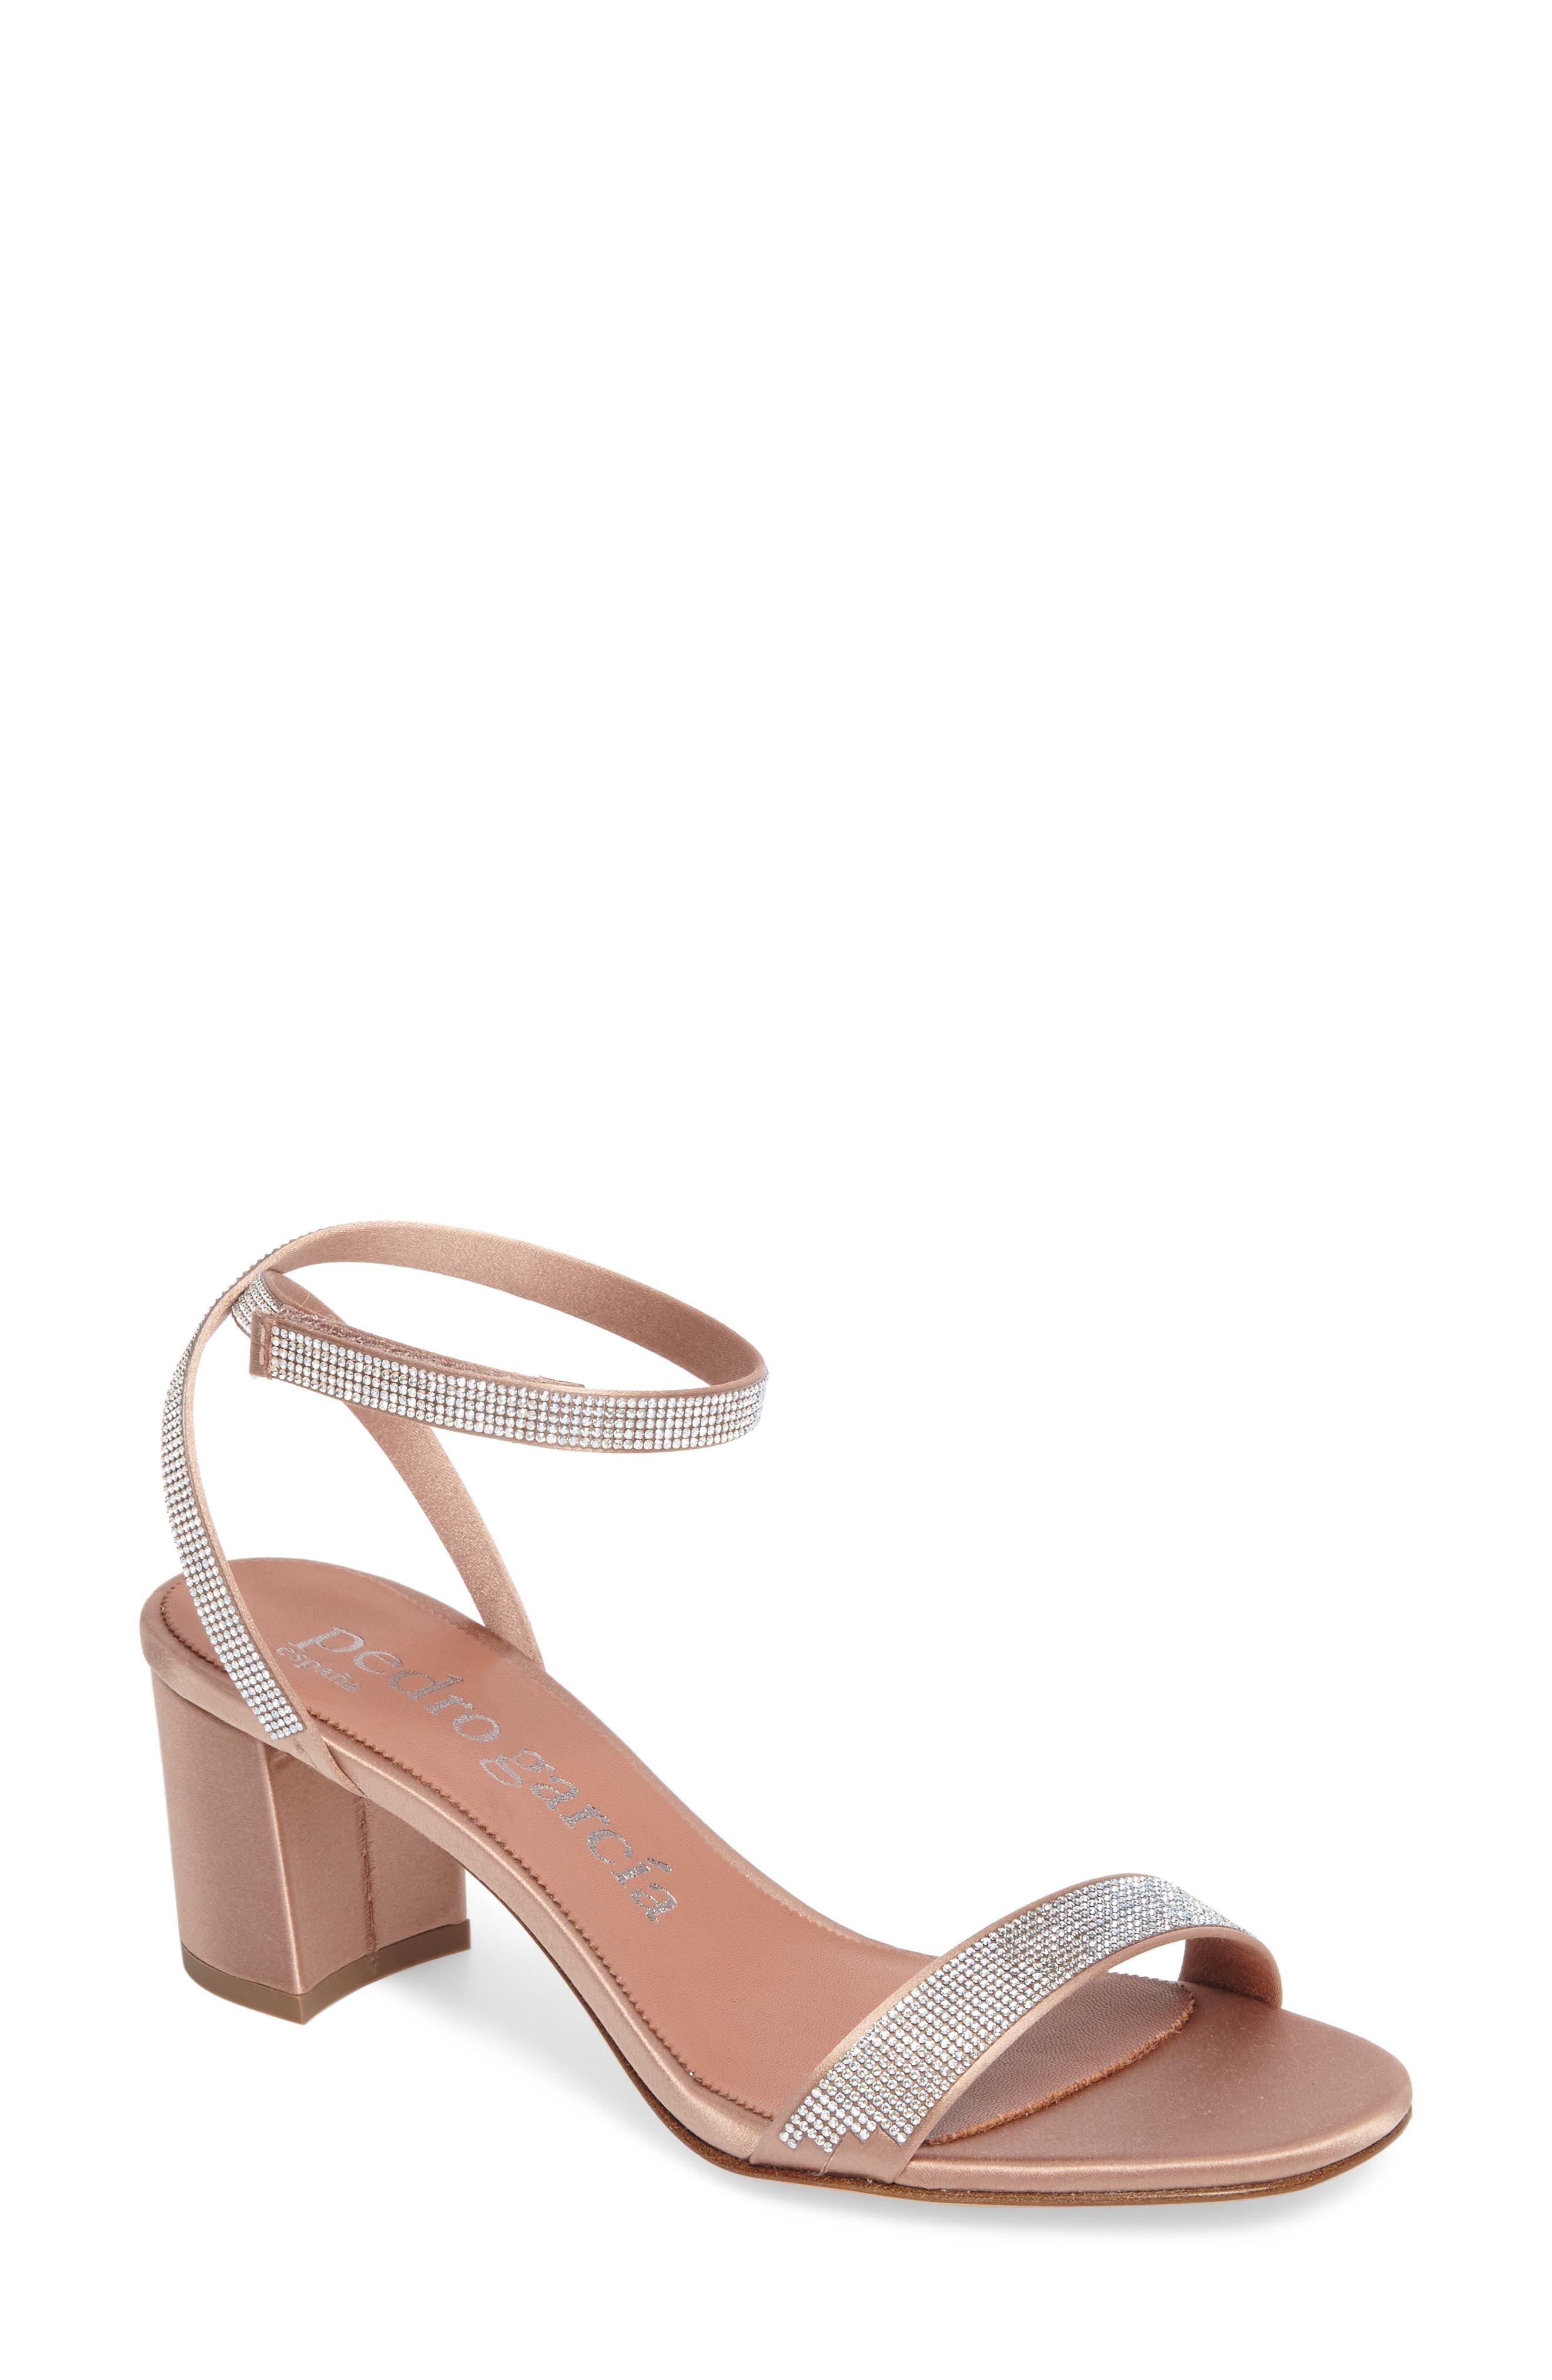 Main Image - Pedro Garcia Xela Block Heel Sandal (Women)